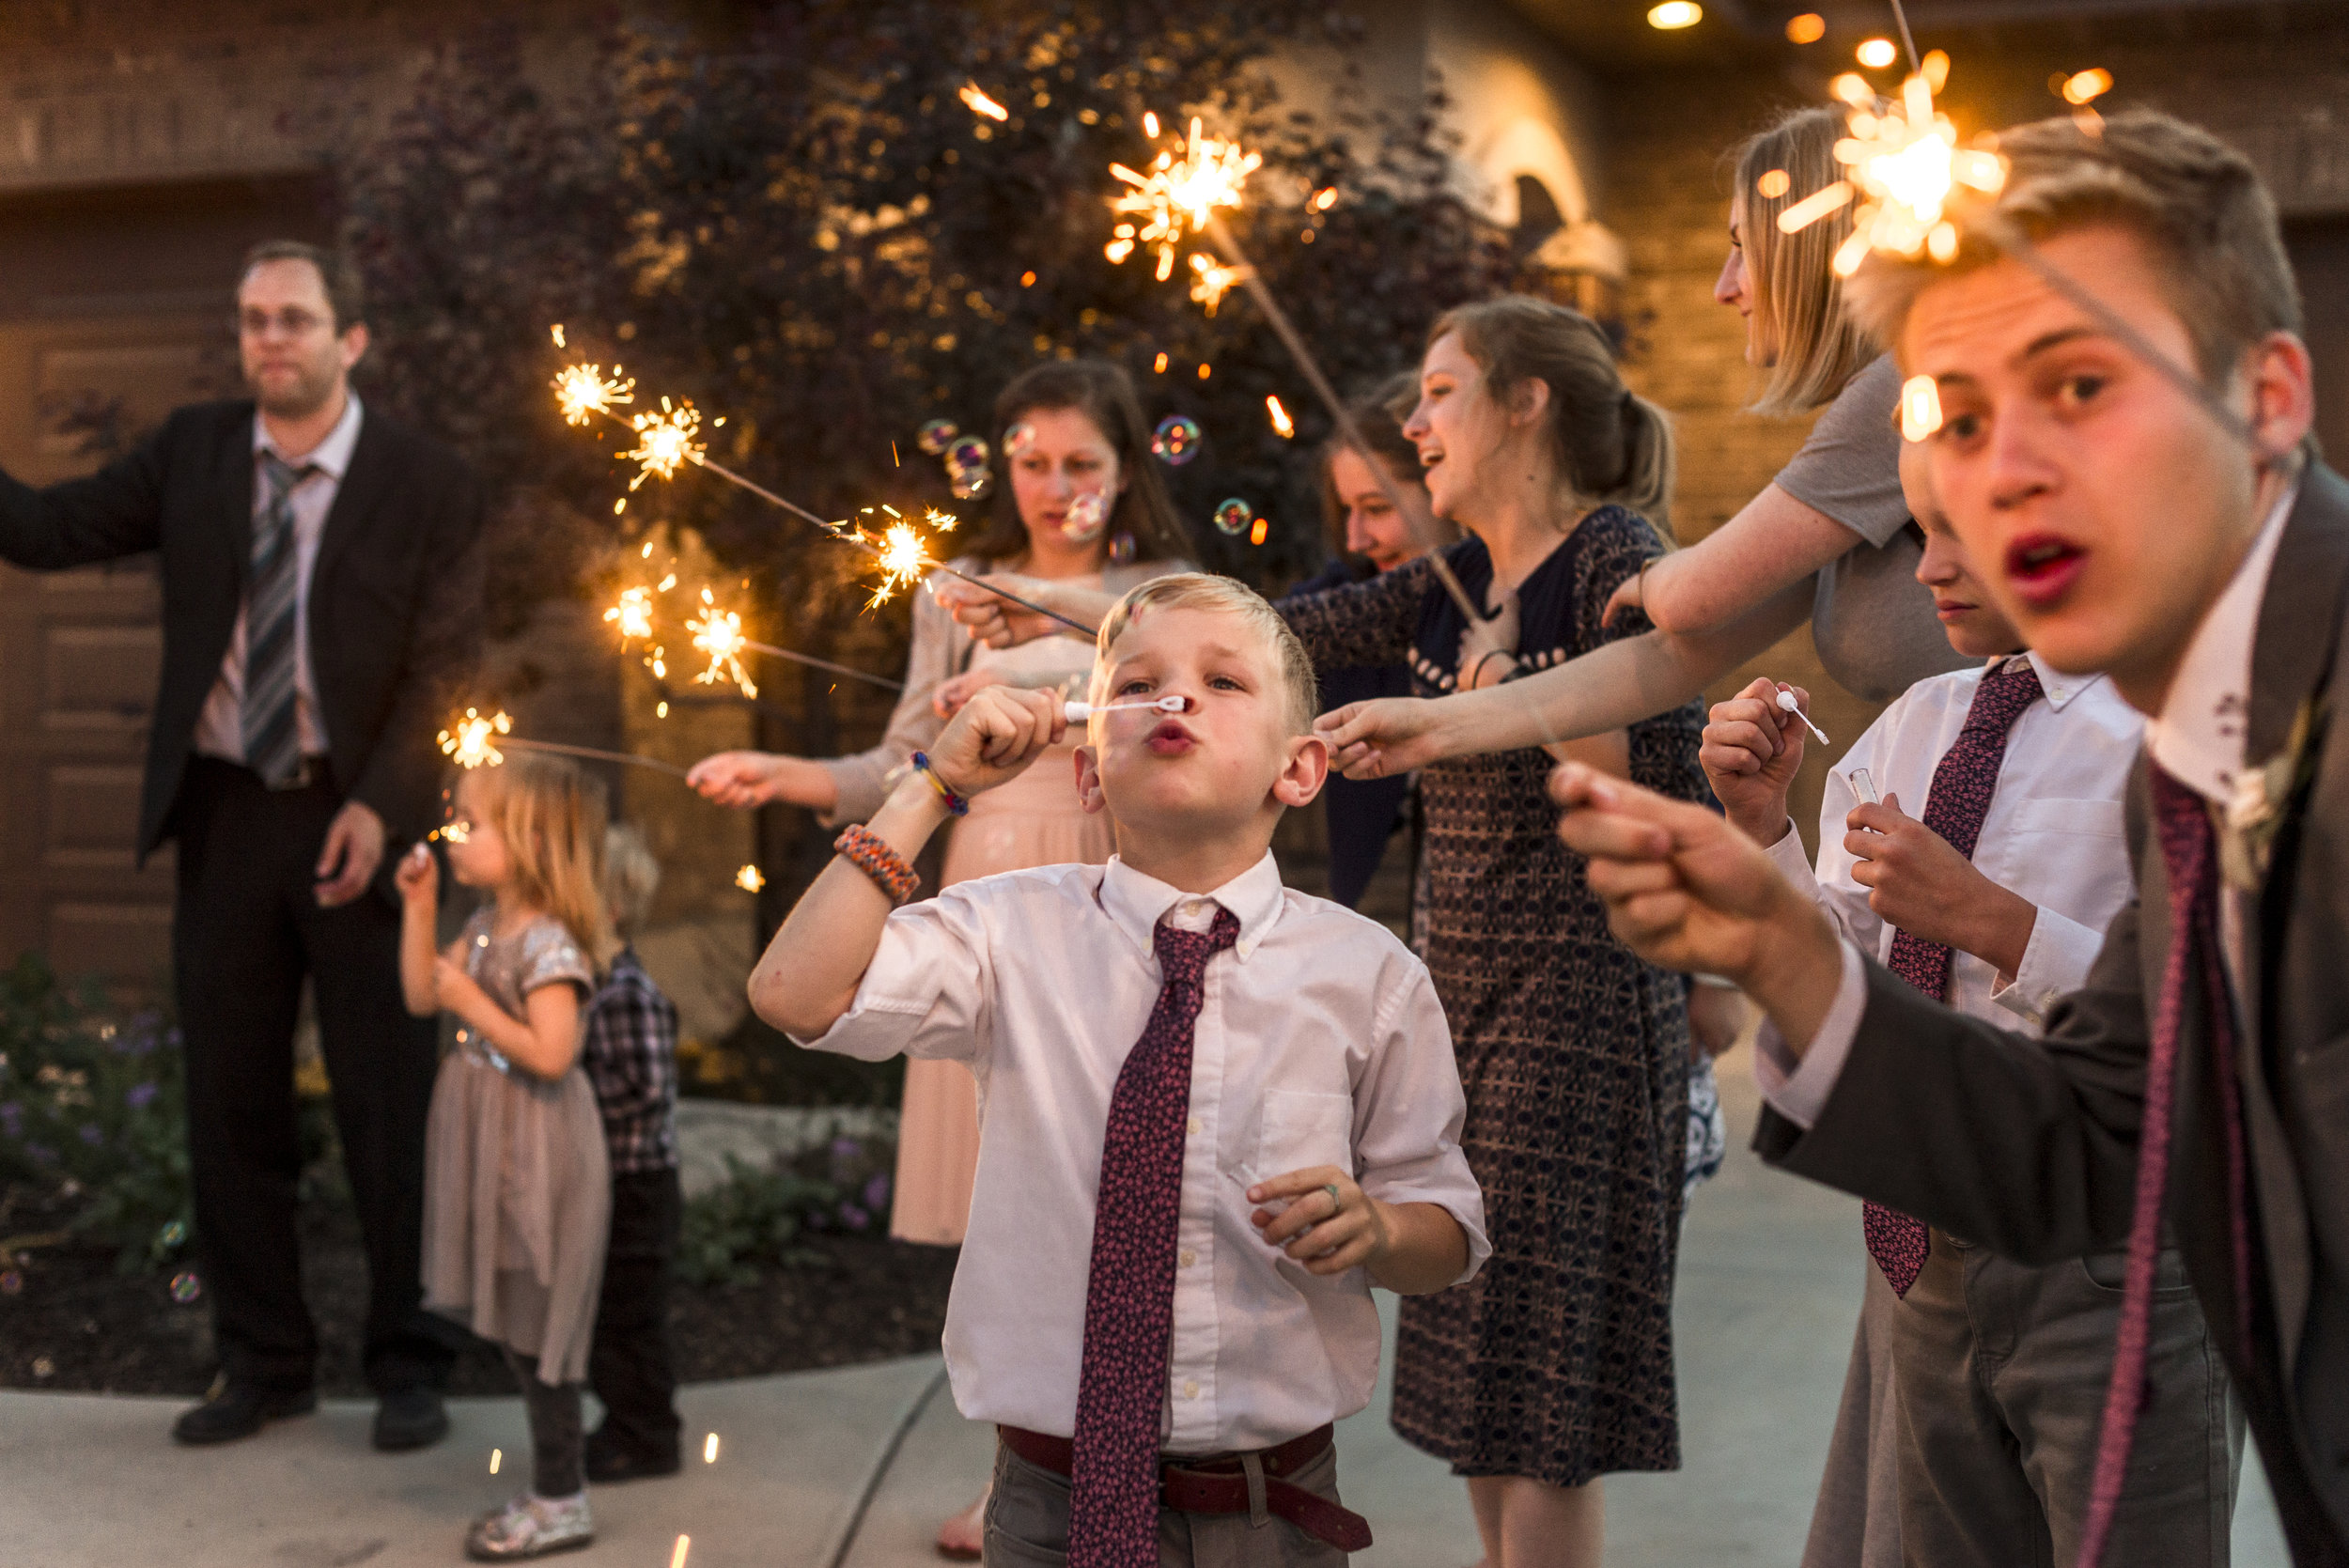 LDS Summer Wedding | South Jordan, Utah Wedding Photographer| Bri Bergman Photography 34.JPG